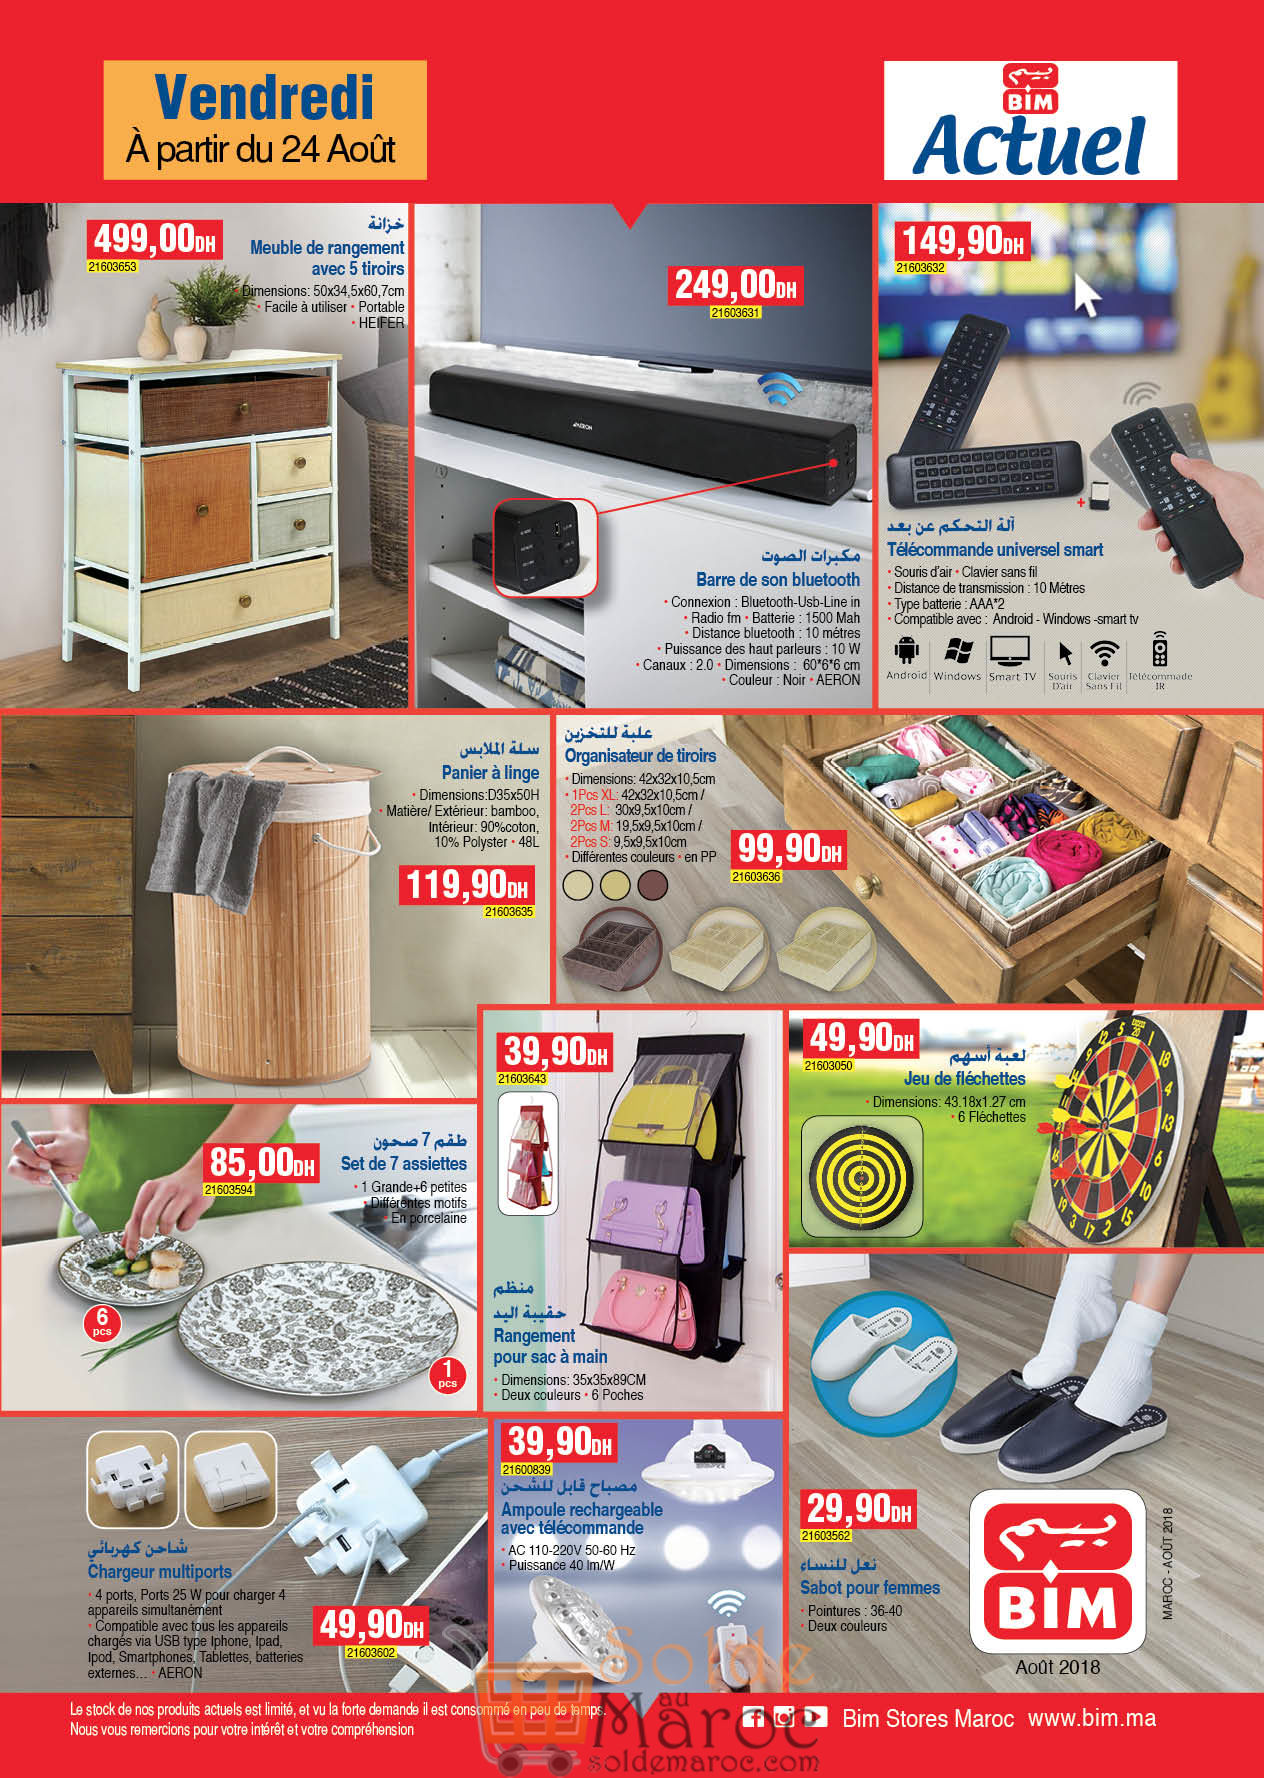 Catalogue Bim Maroc du Vendredi 24 Août 2018